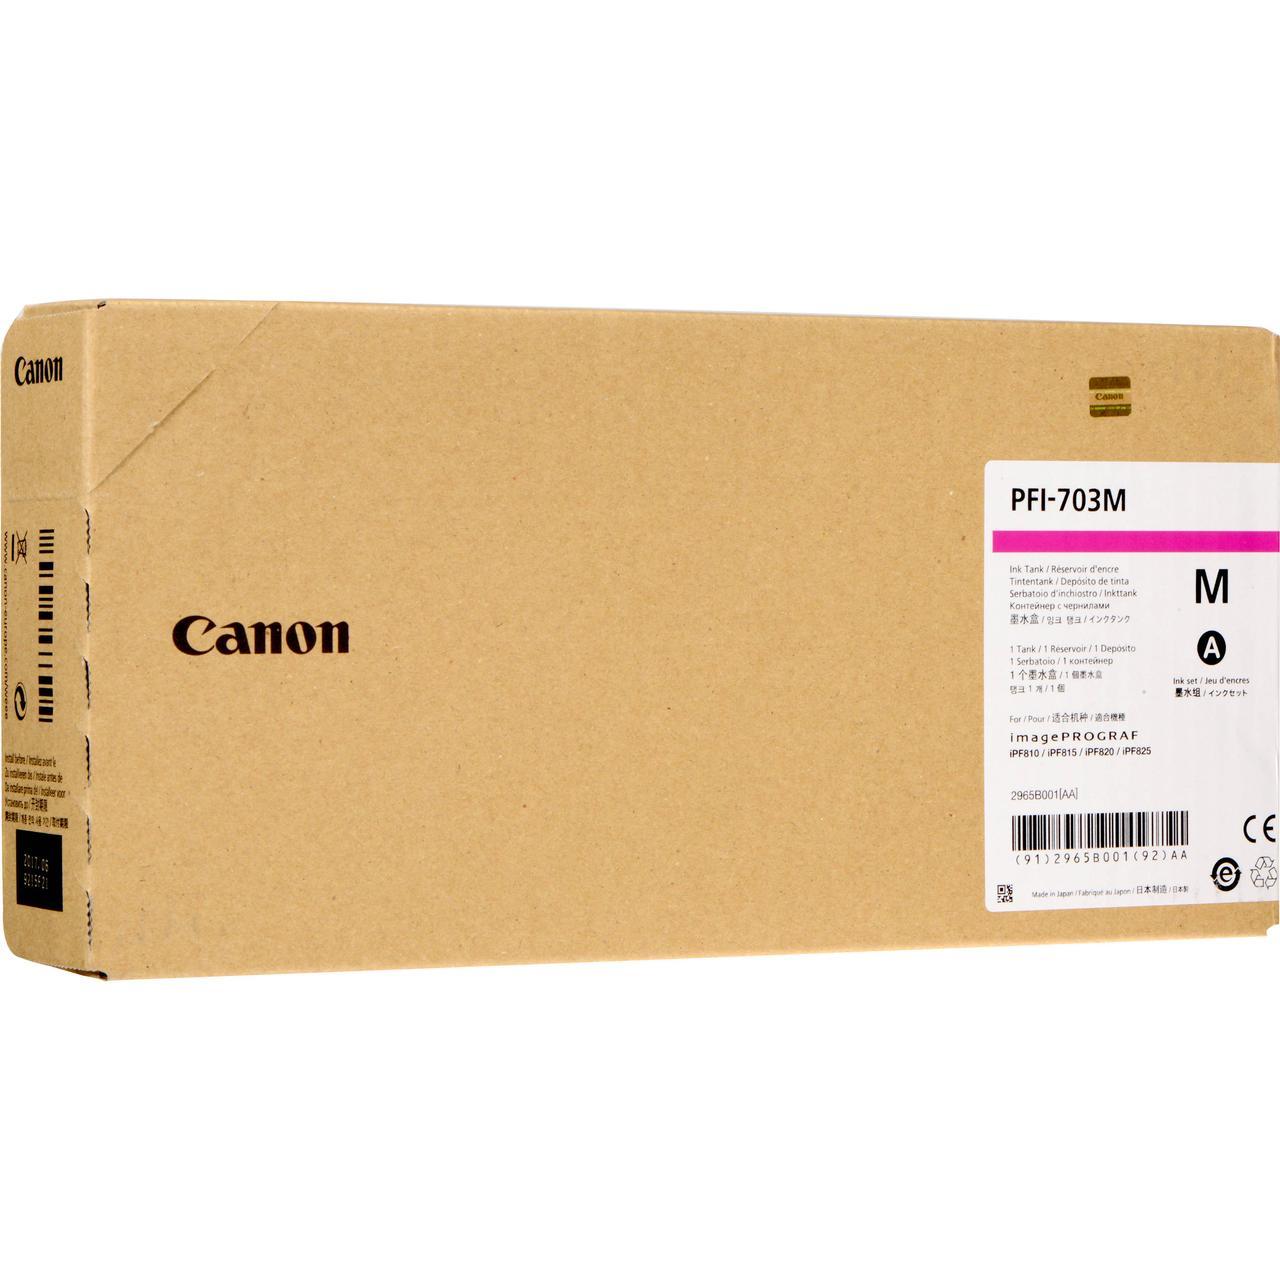 Картридж Canon PFI-707M для iPF830/840/850, Magenta, 700 мл